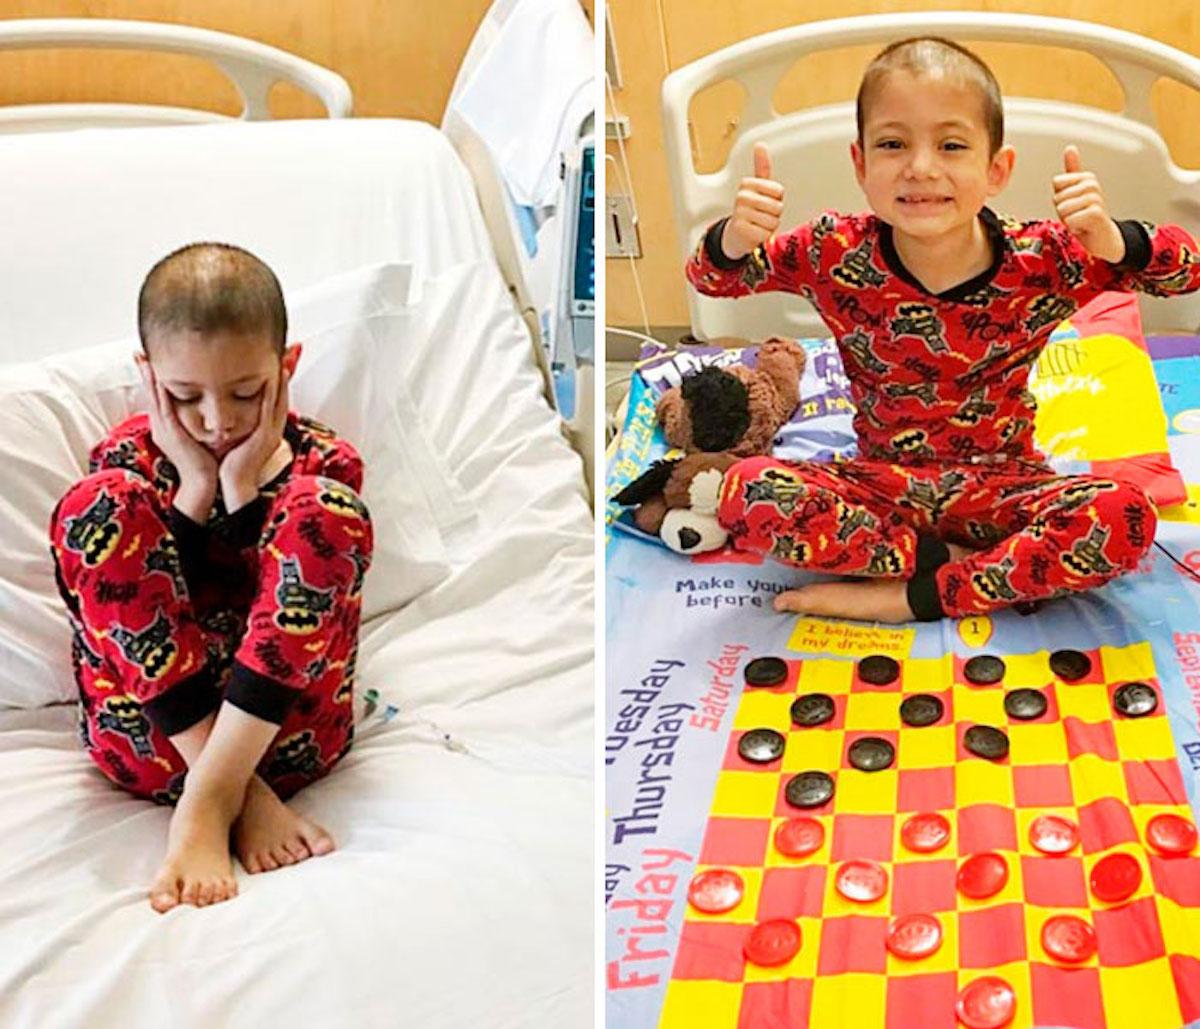 Kevin Gatlin draps jeux enfants hôpital